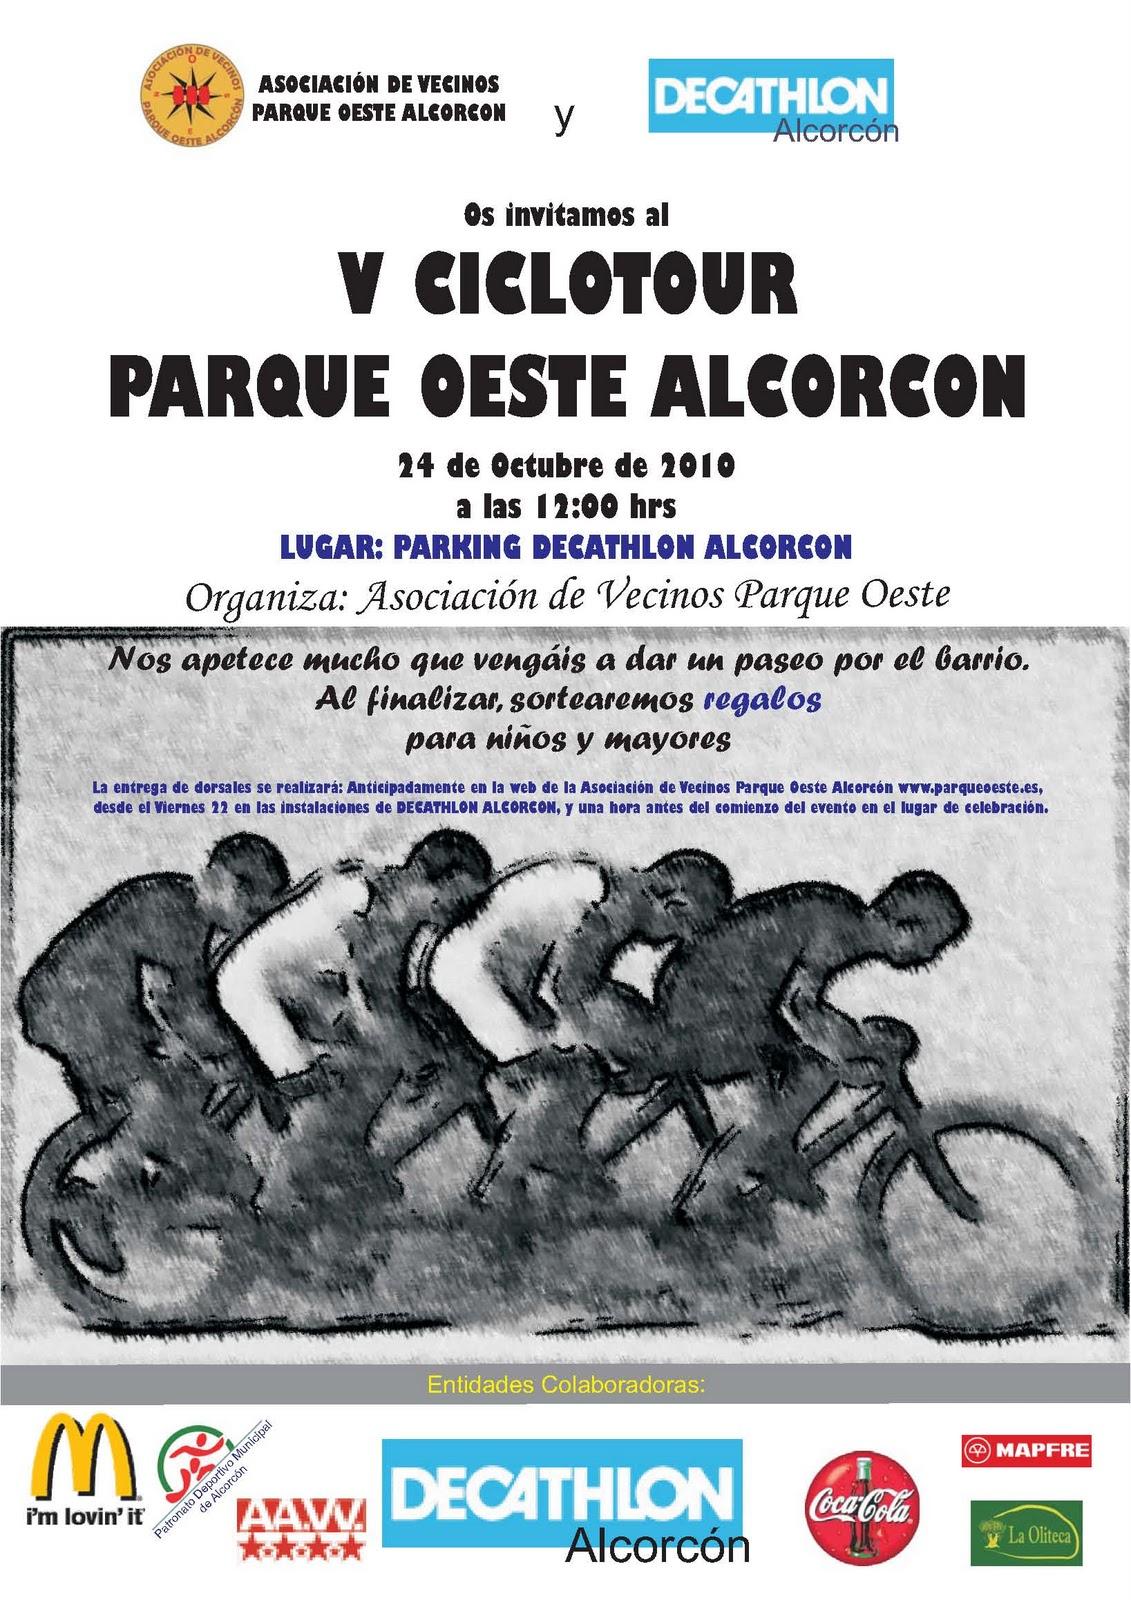 Avv parque oeste alcorc n v ciclotour parque oeste alcorcon - Parque oeste alcorcon ...